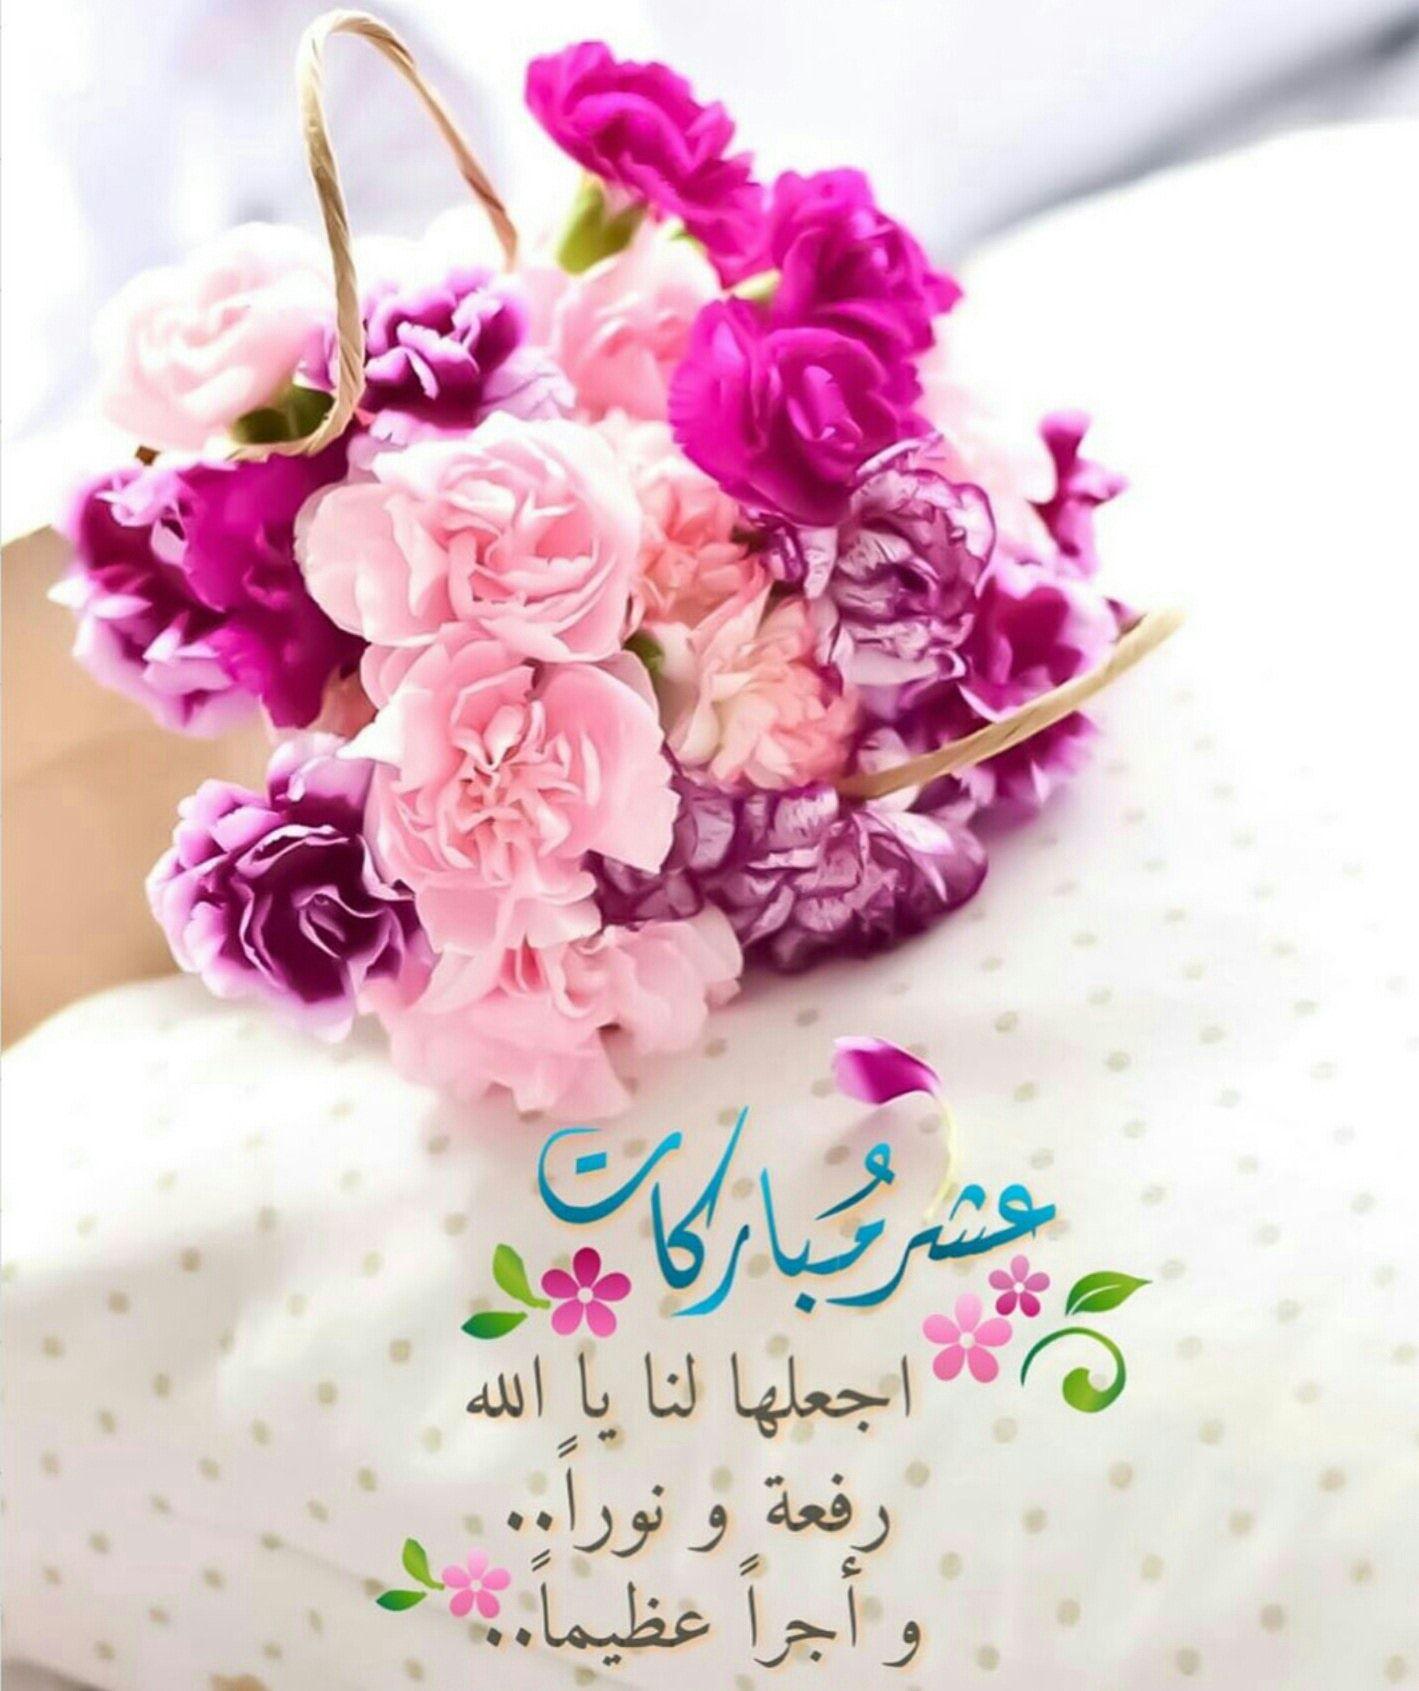 Pin By صورة و كلمة On و ٱذ ك ر وا ٱلل ه ف ى أ ي ام م ع د ود ت ذو الحجة Ramadan Crown Jewelry